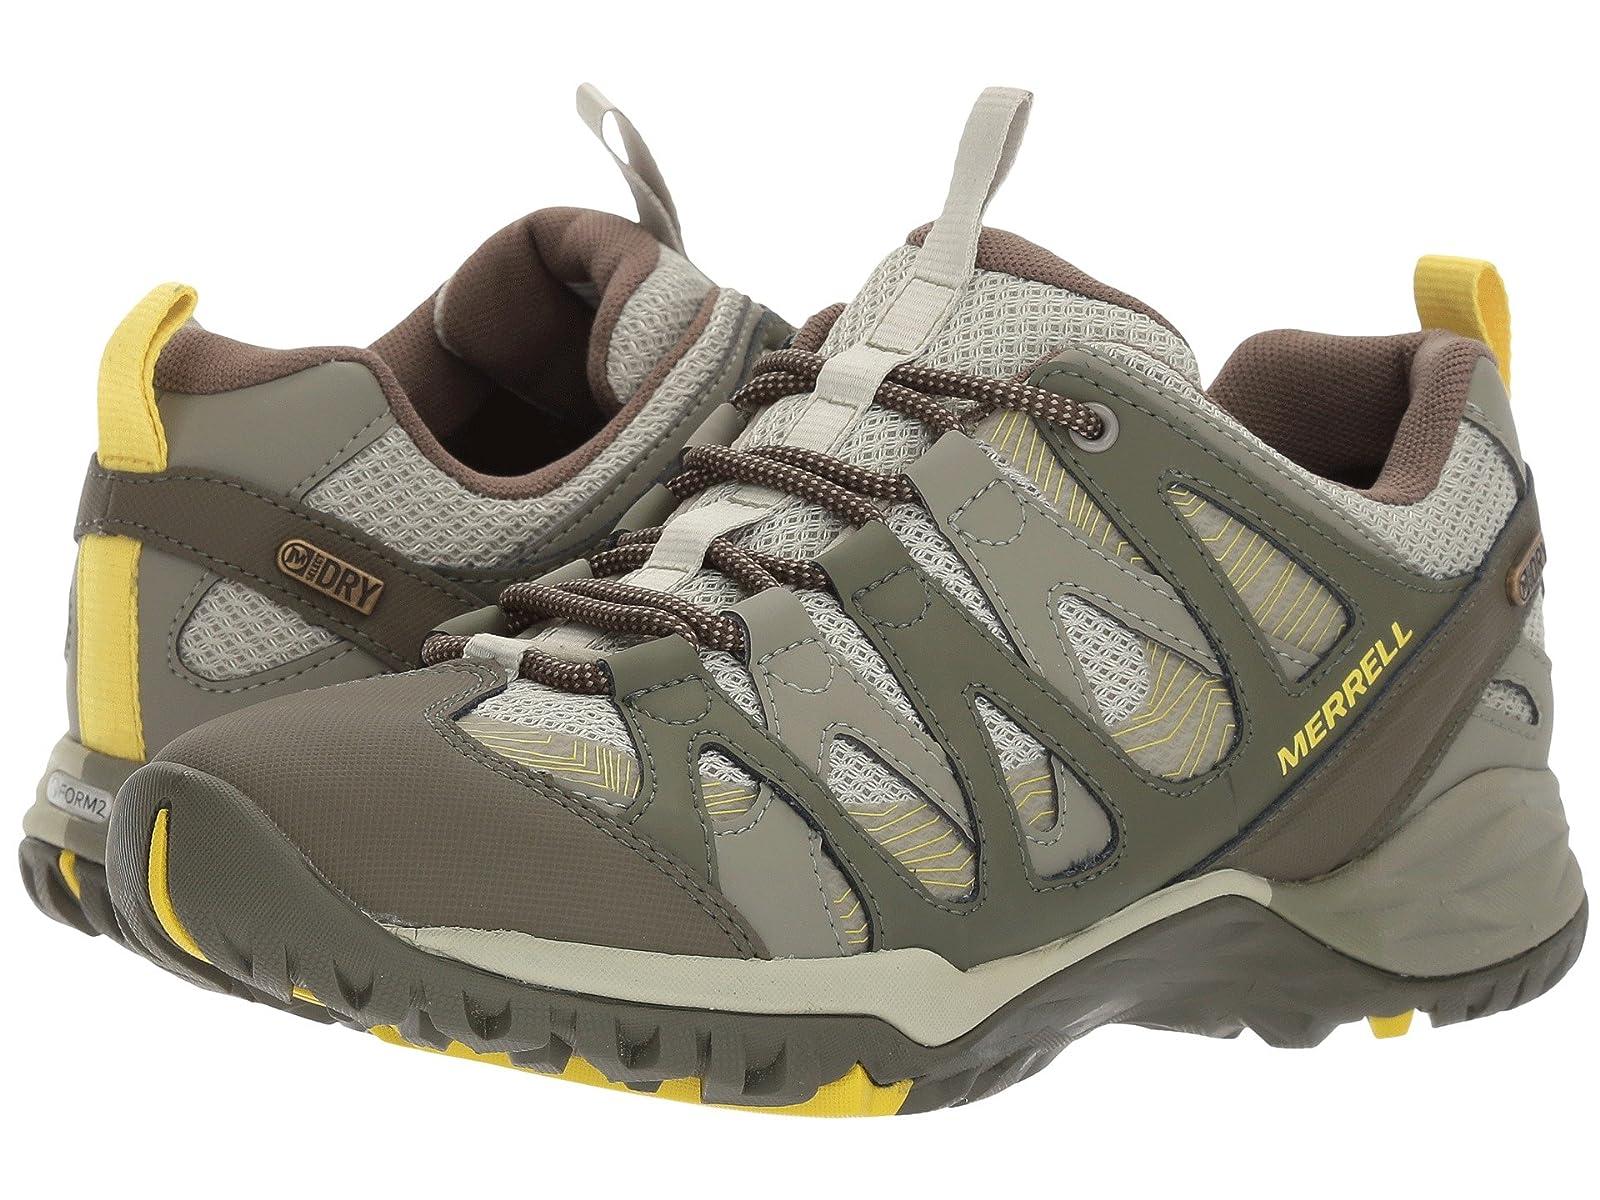 Merrell Siren Hex Q2 WaterproofCheap and distinctive eye-catching shoes